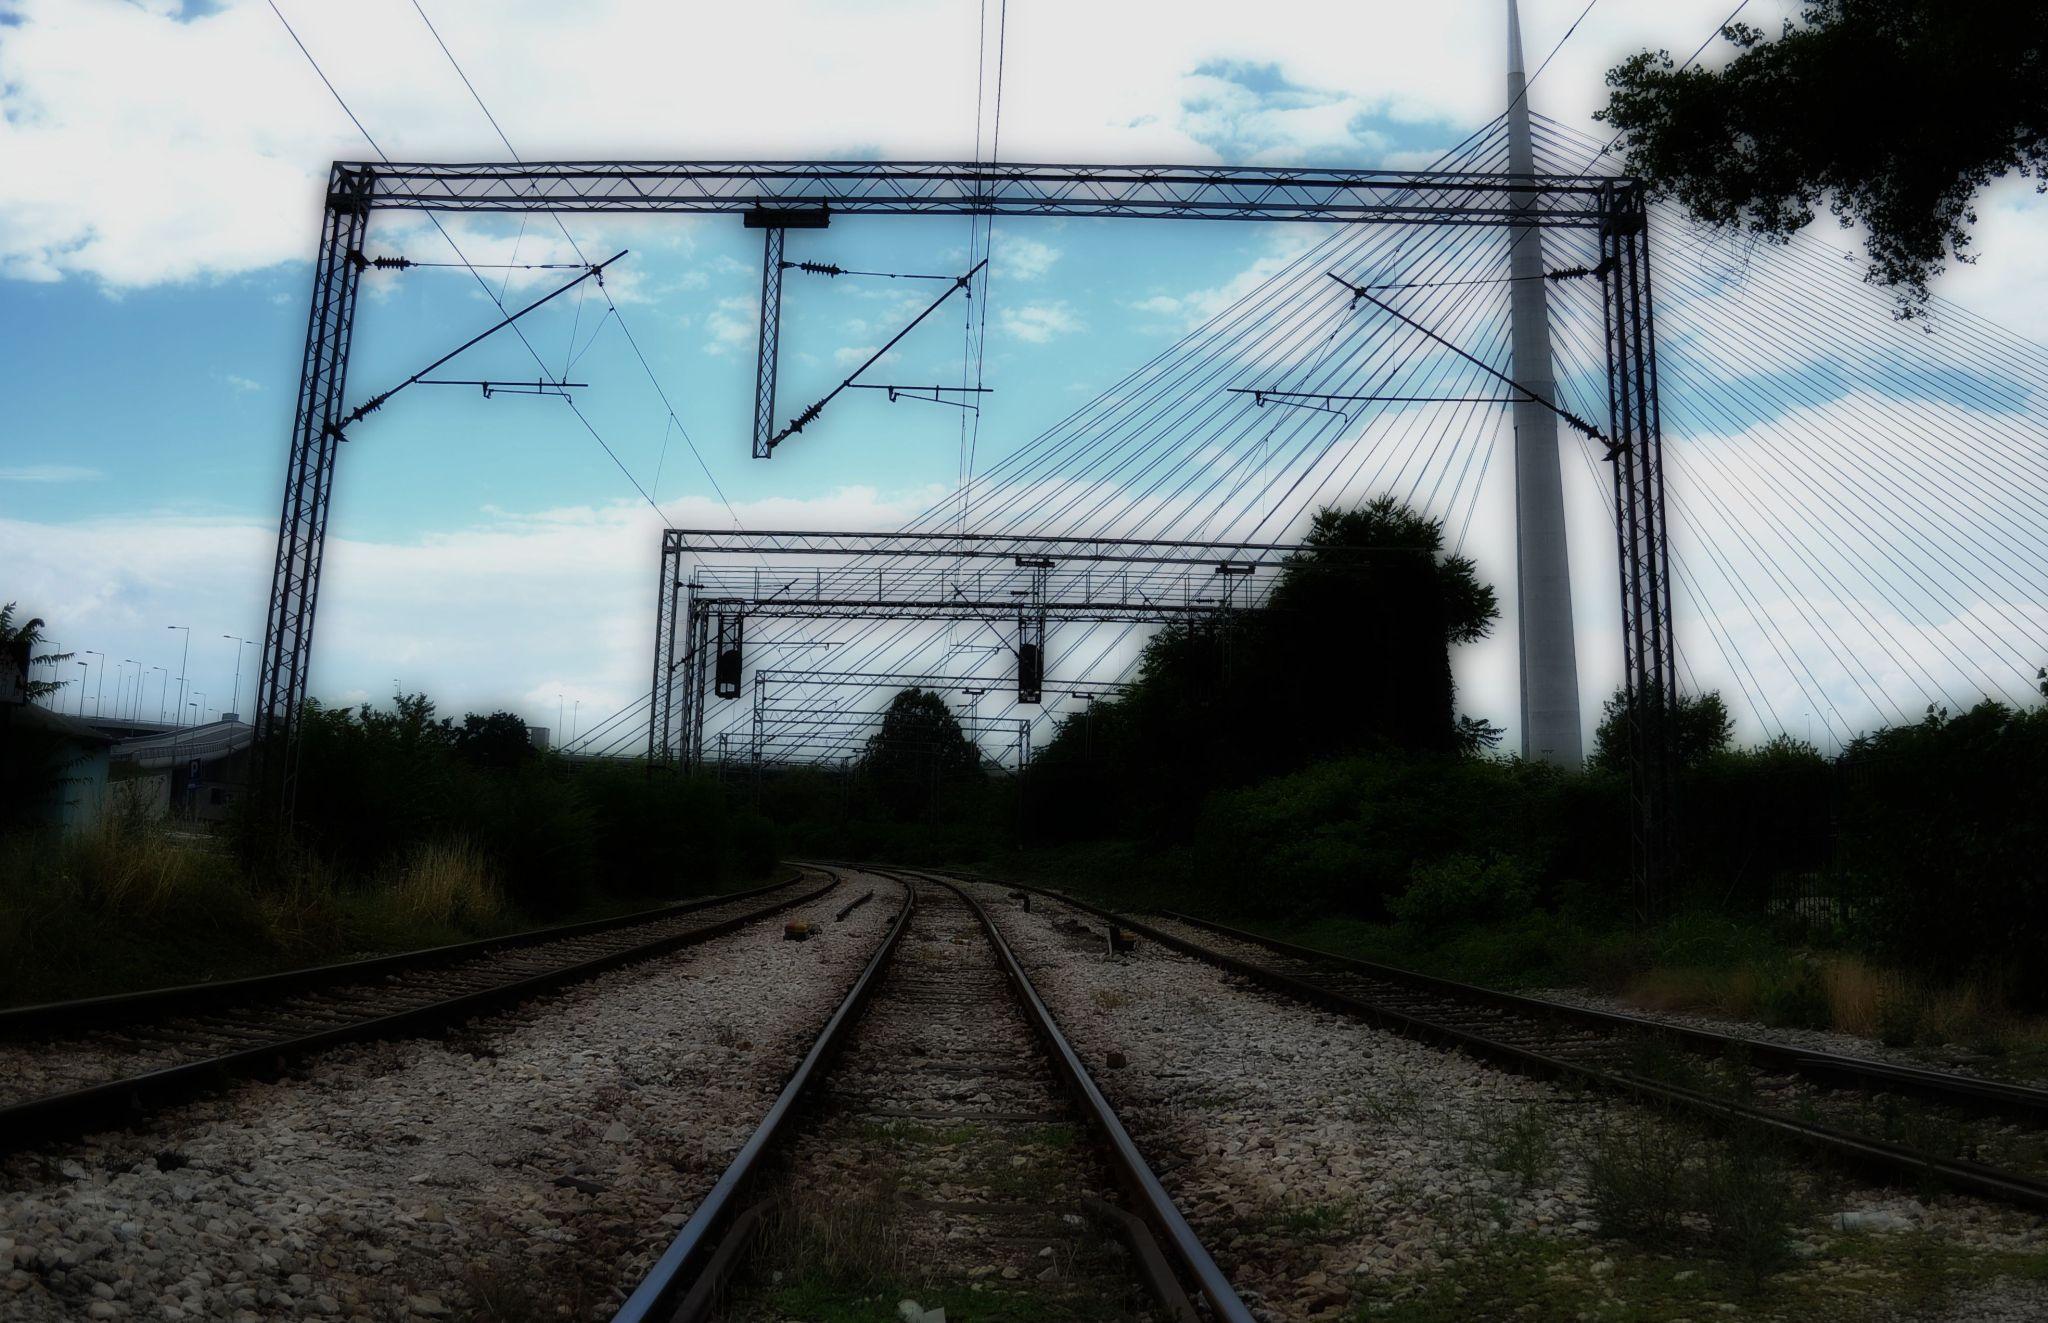 Untitled by njezic2284